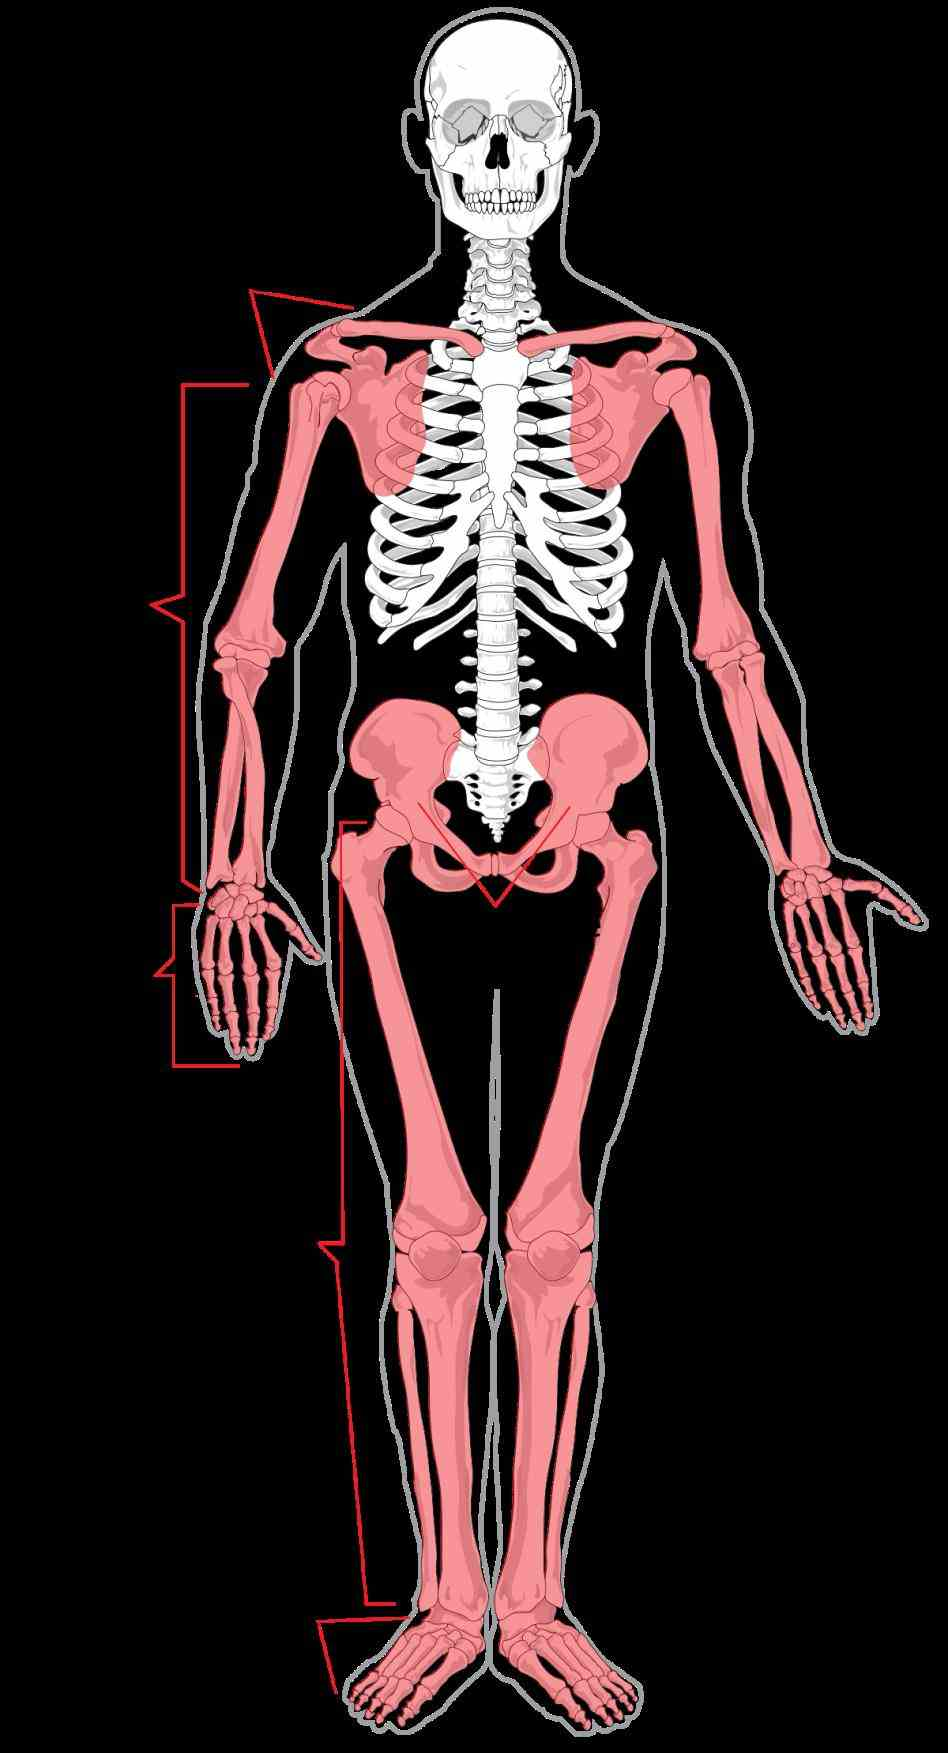 the Appendicular Skeletal System appendicular skeleton is portion of vertebrates consisting bones or cartilage that support appendages appeared